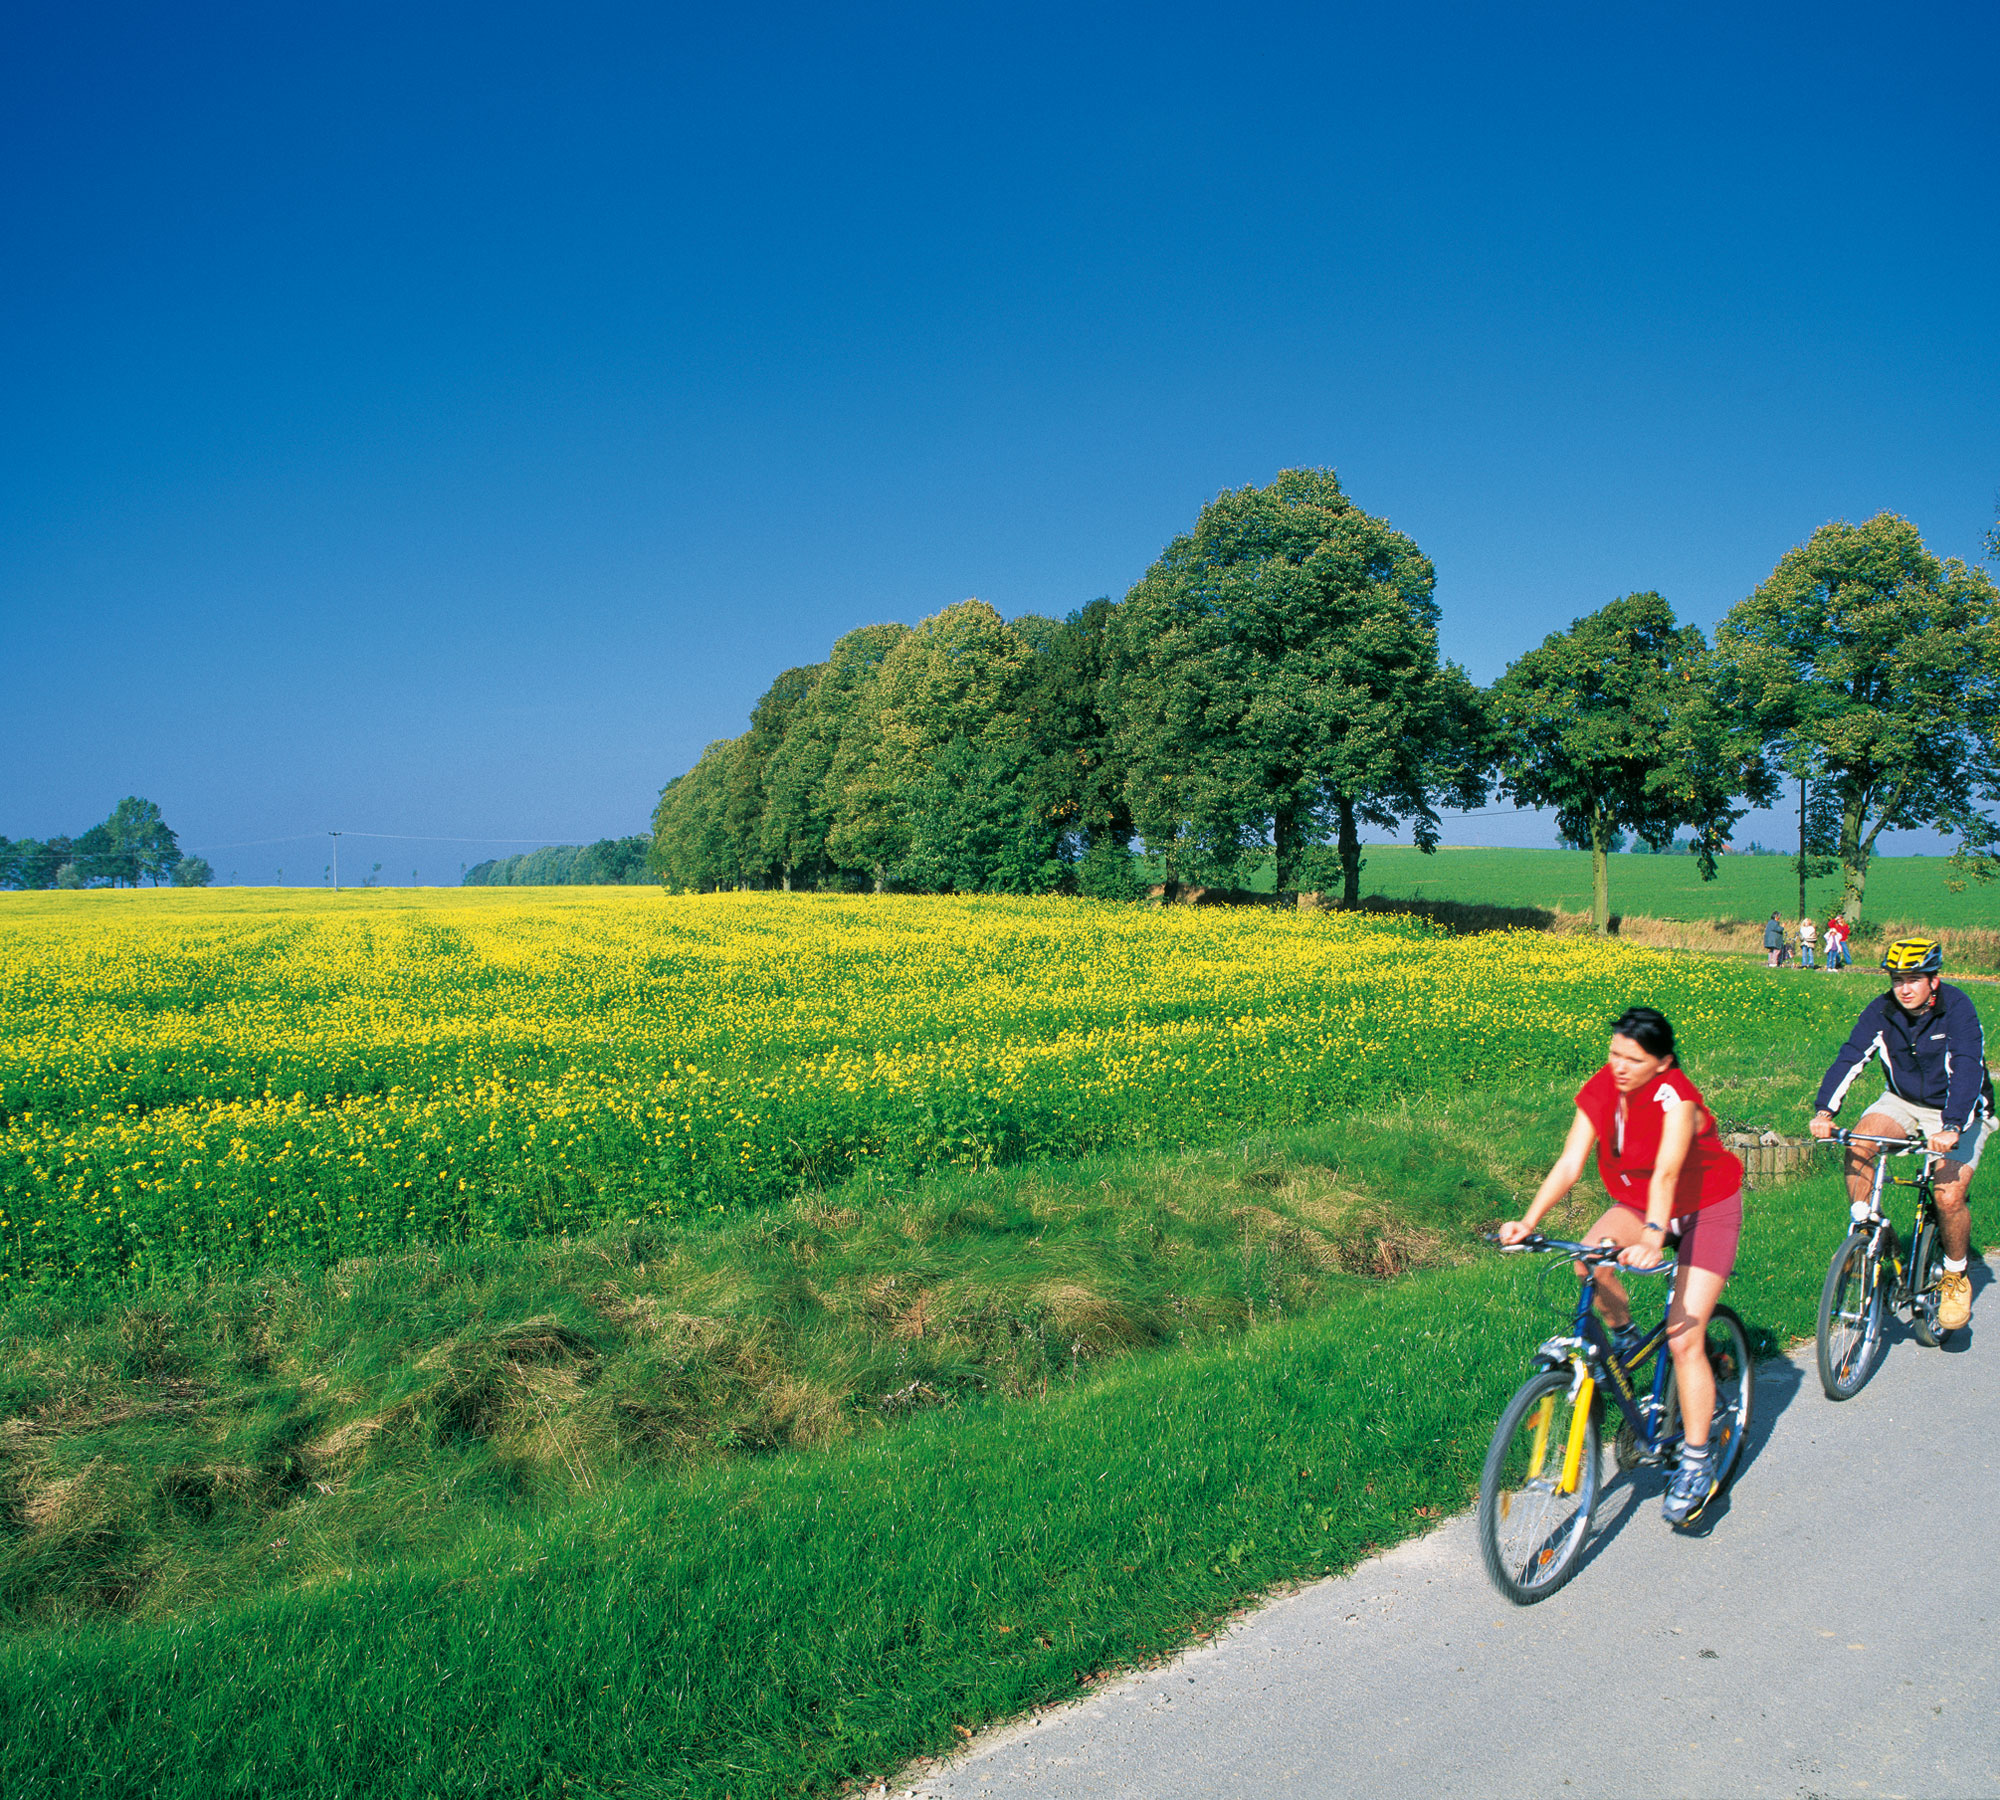 Auschnitt der Fahrradstrecke   HIMBEER Magazin